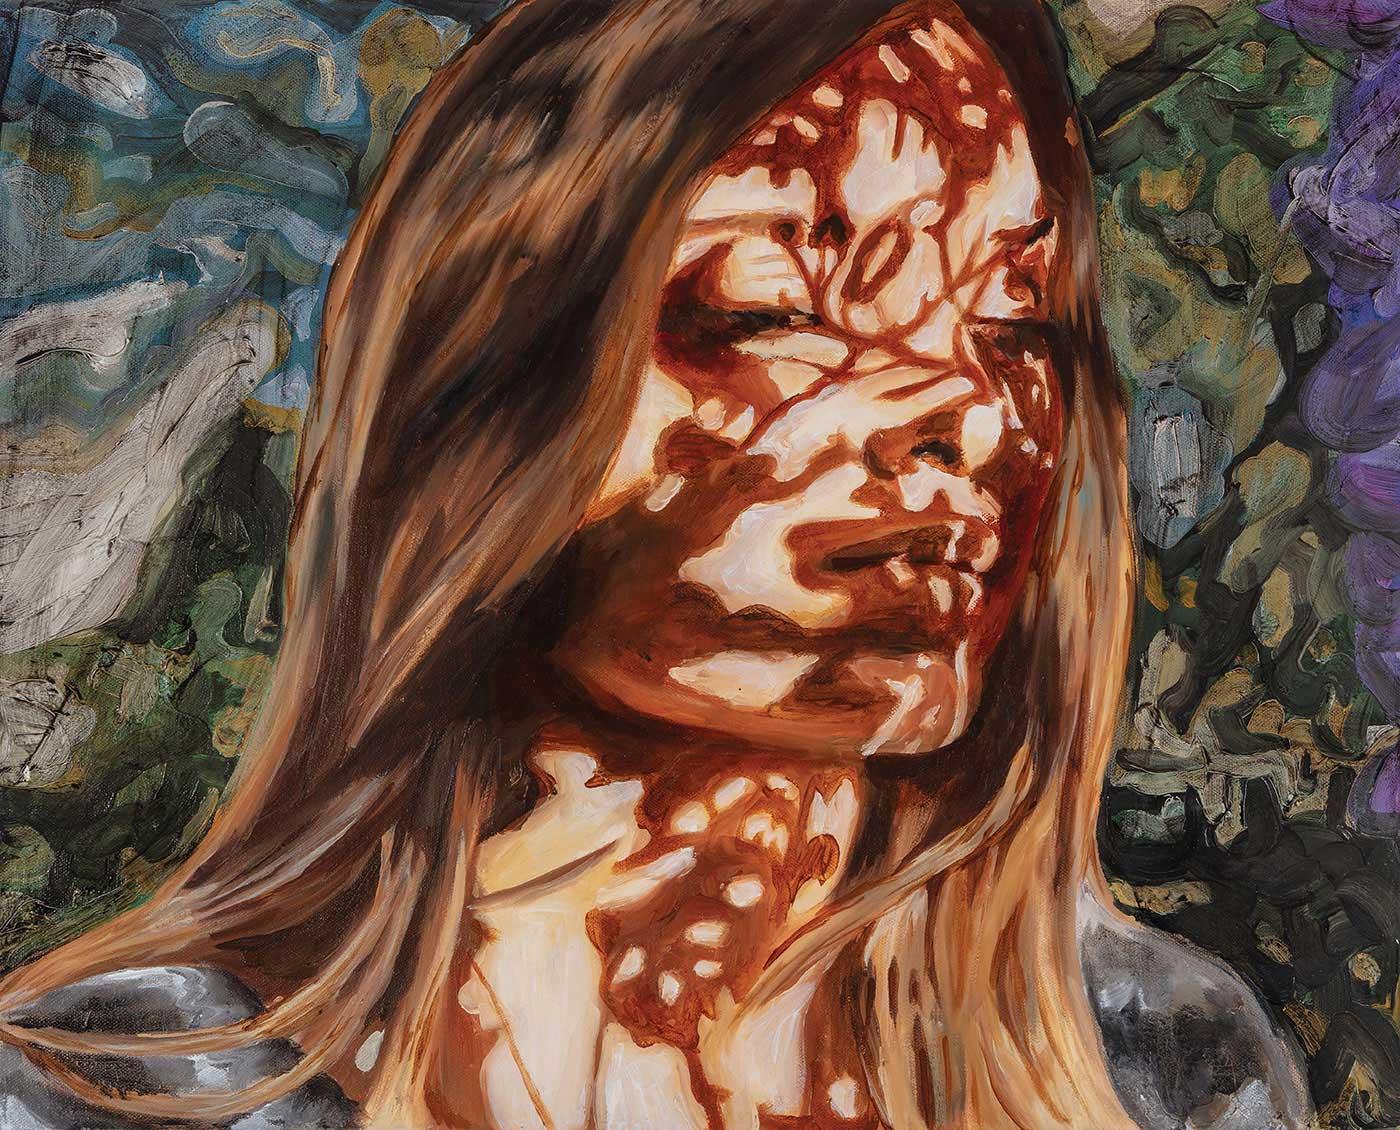 Sydney Peel - In the Shadows